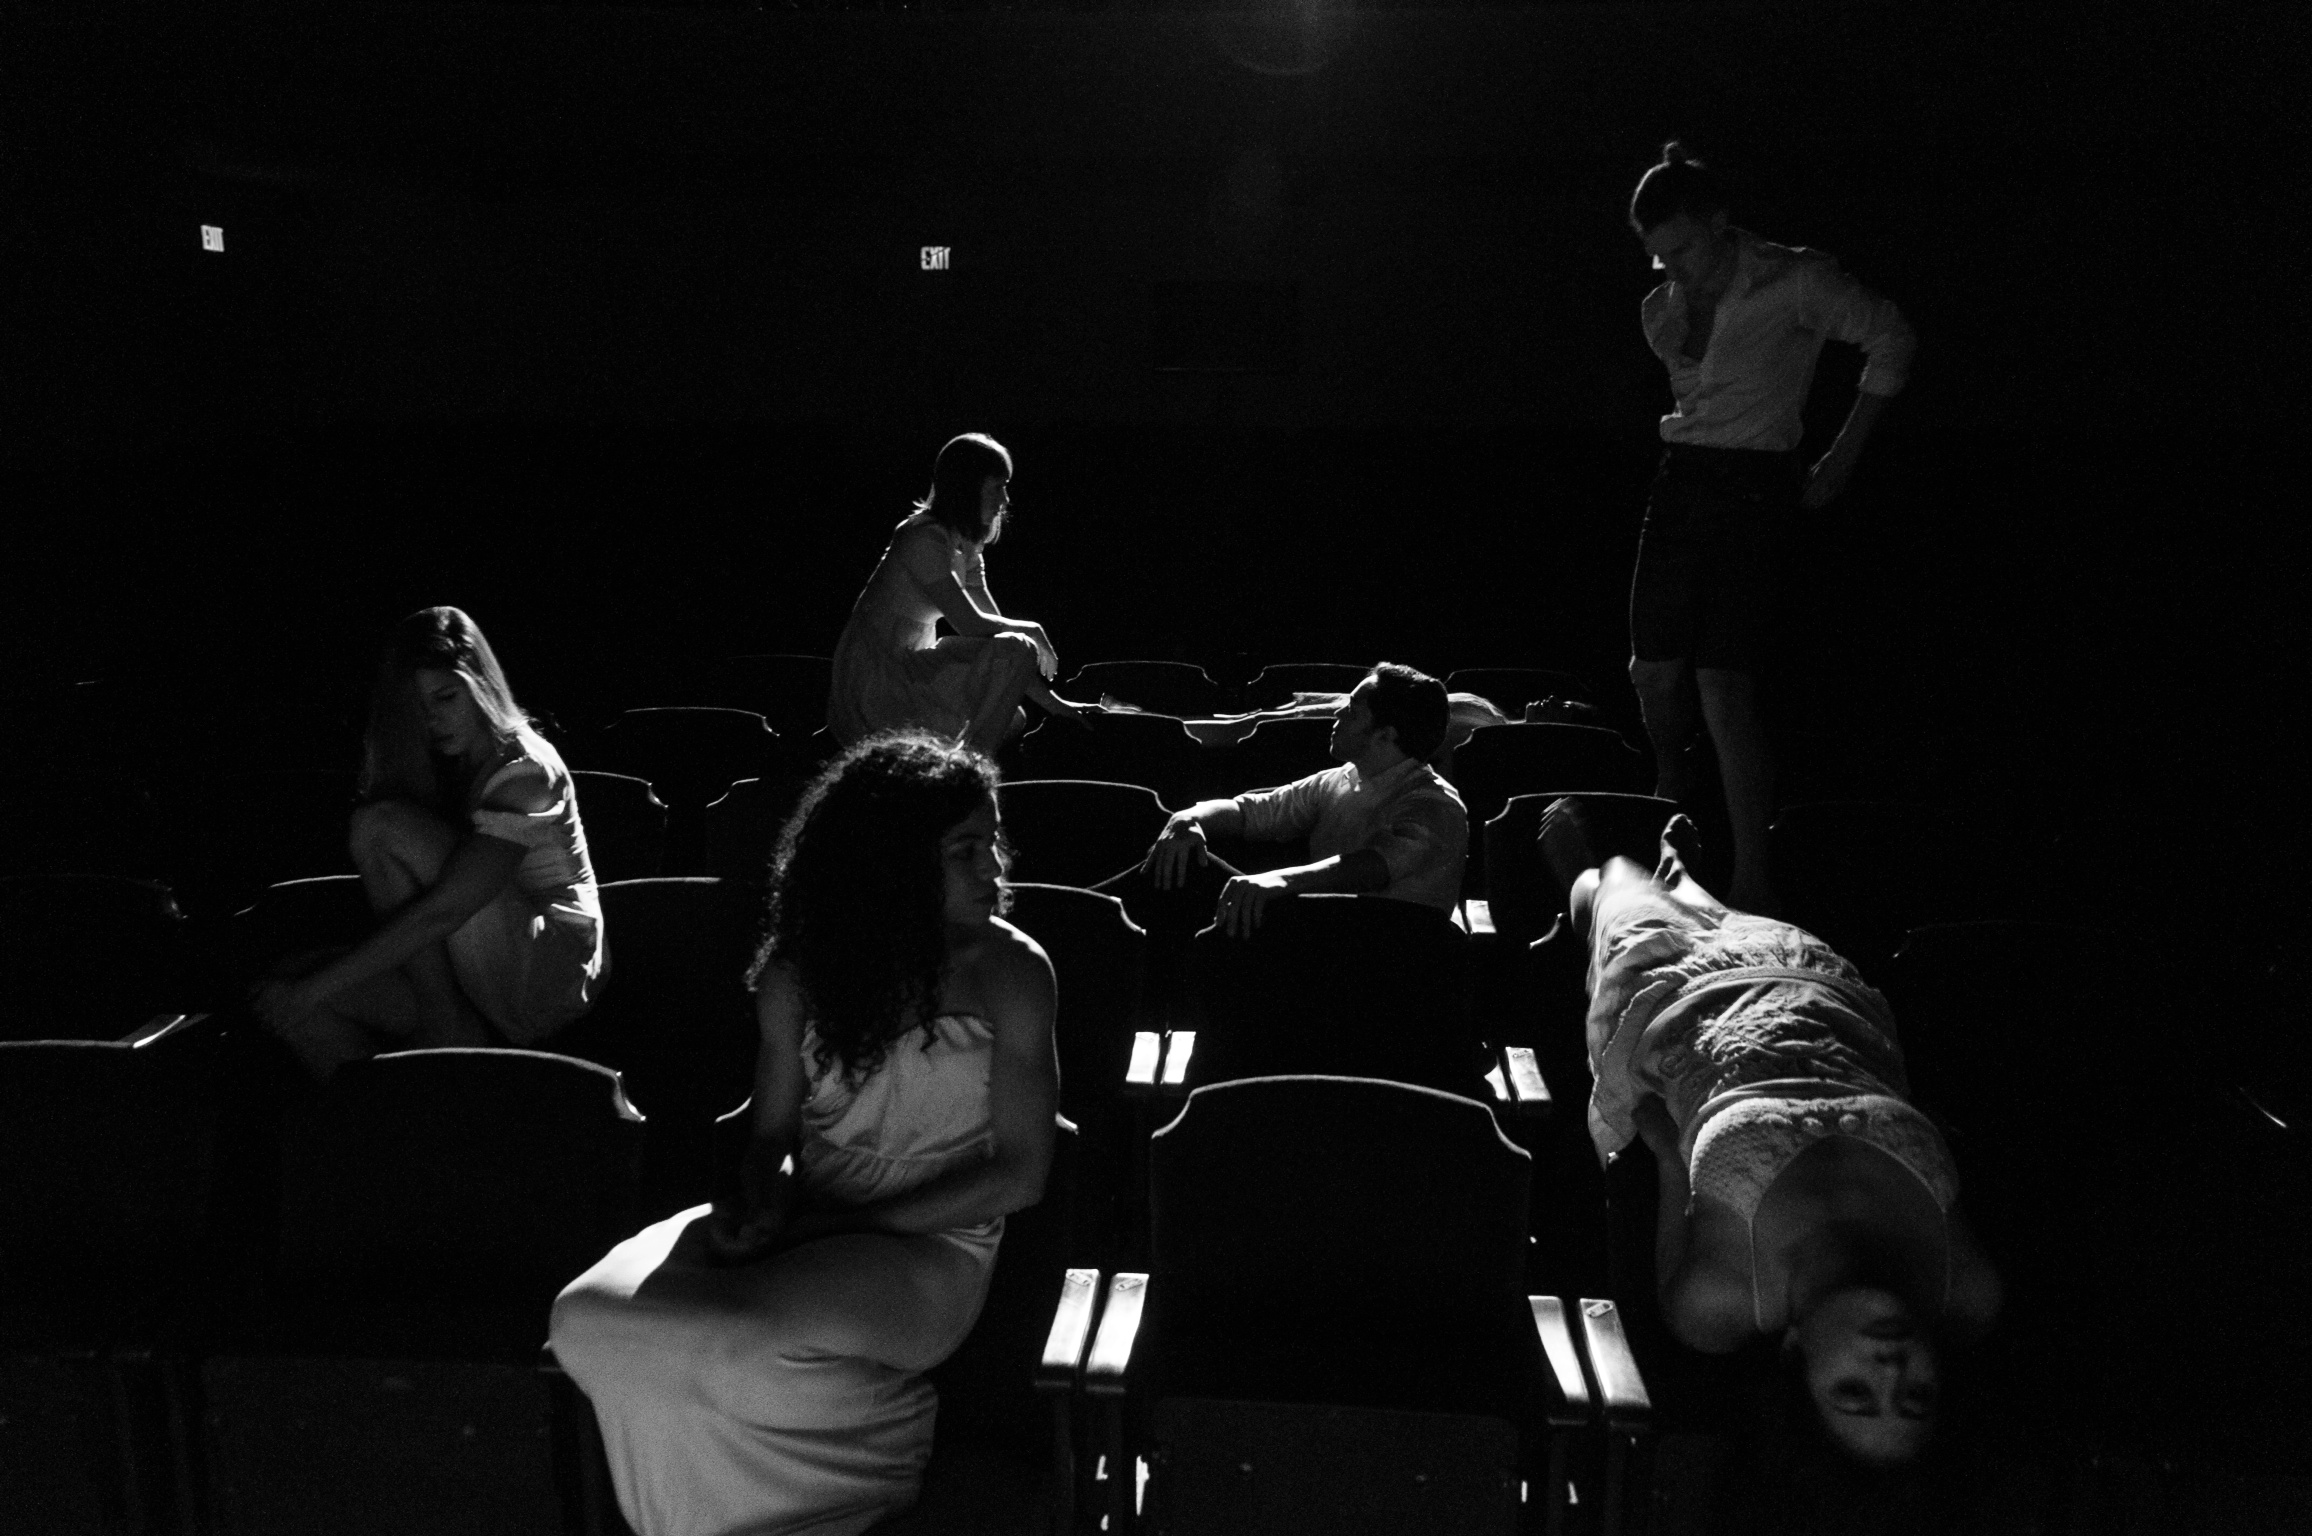 Skye Van Rensselaer, Kristin Yancy, Emily Palmquist, Geoff Kanick,Clinton Edward, Caitlin Cassidy, Nadine Malouf- Photo: John Deamara